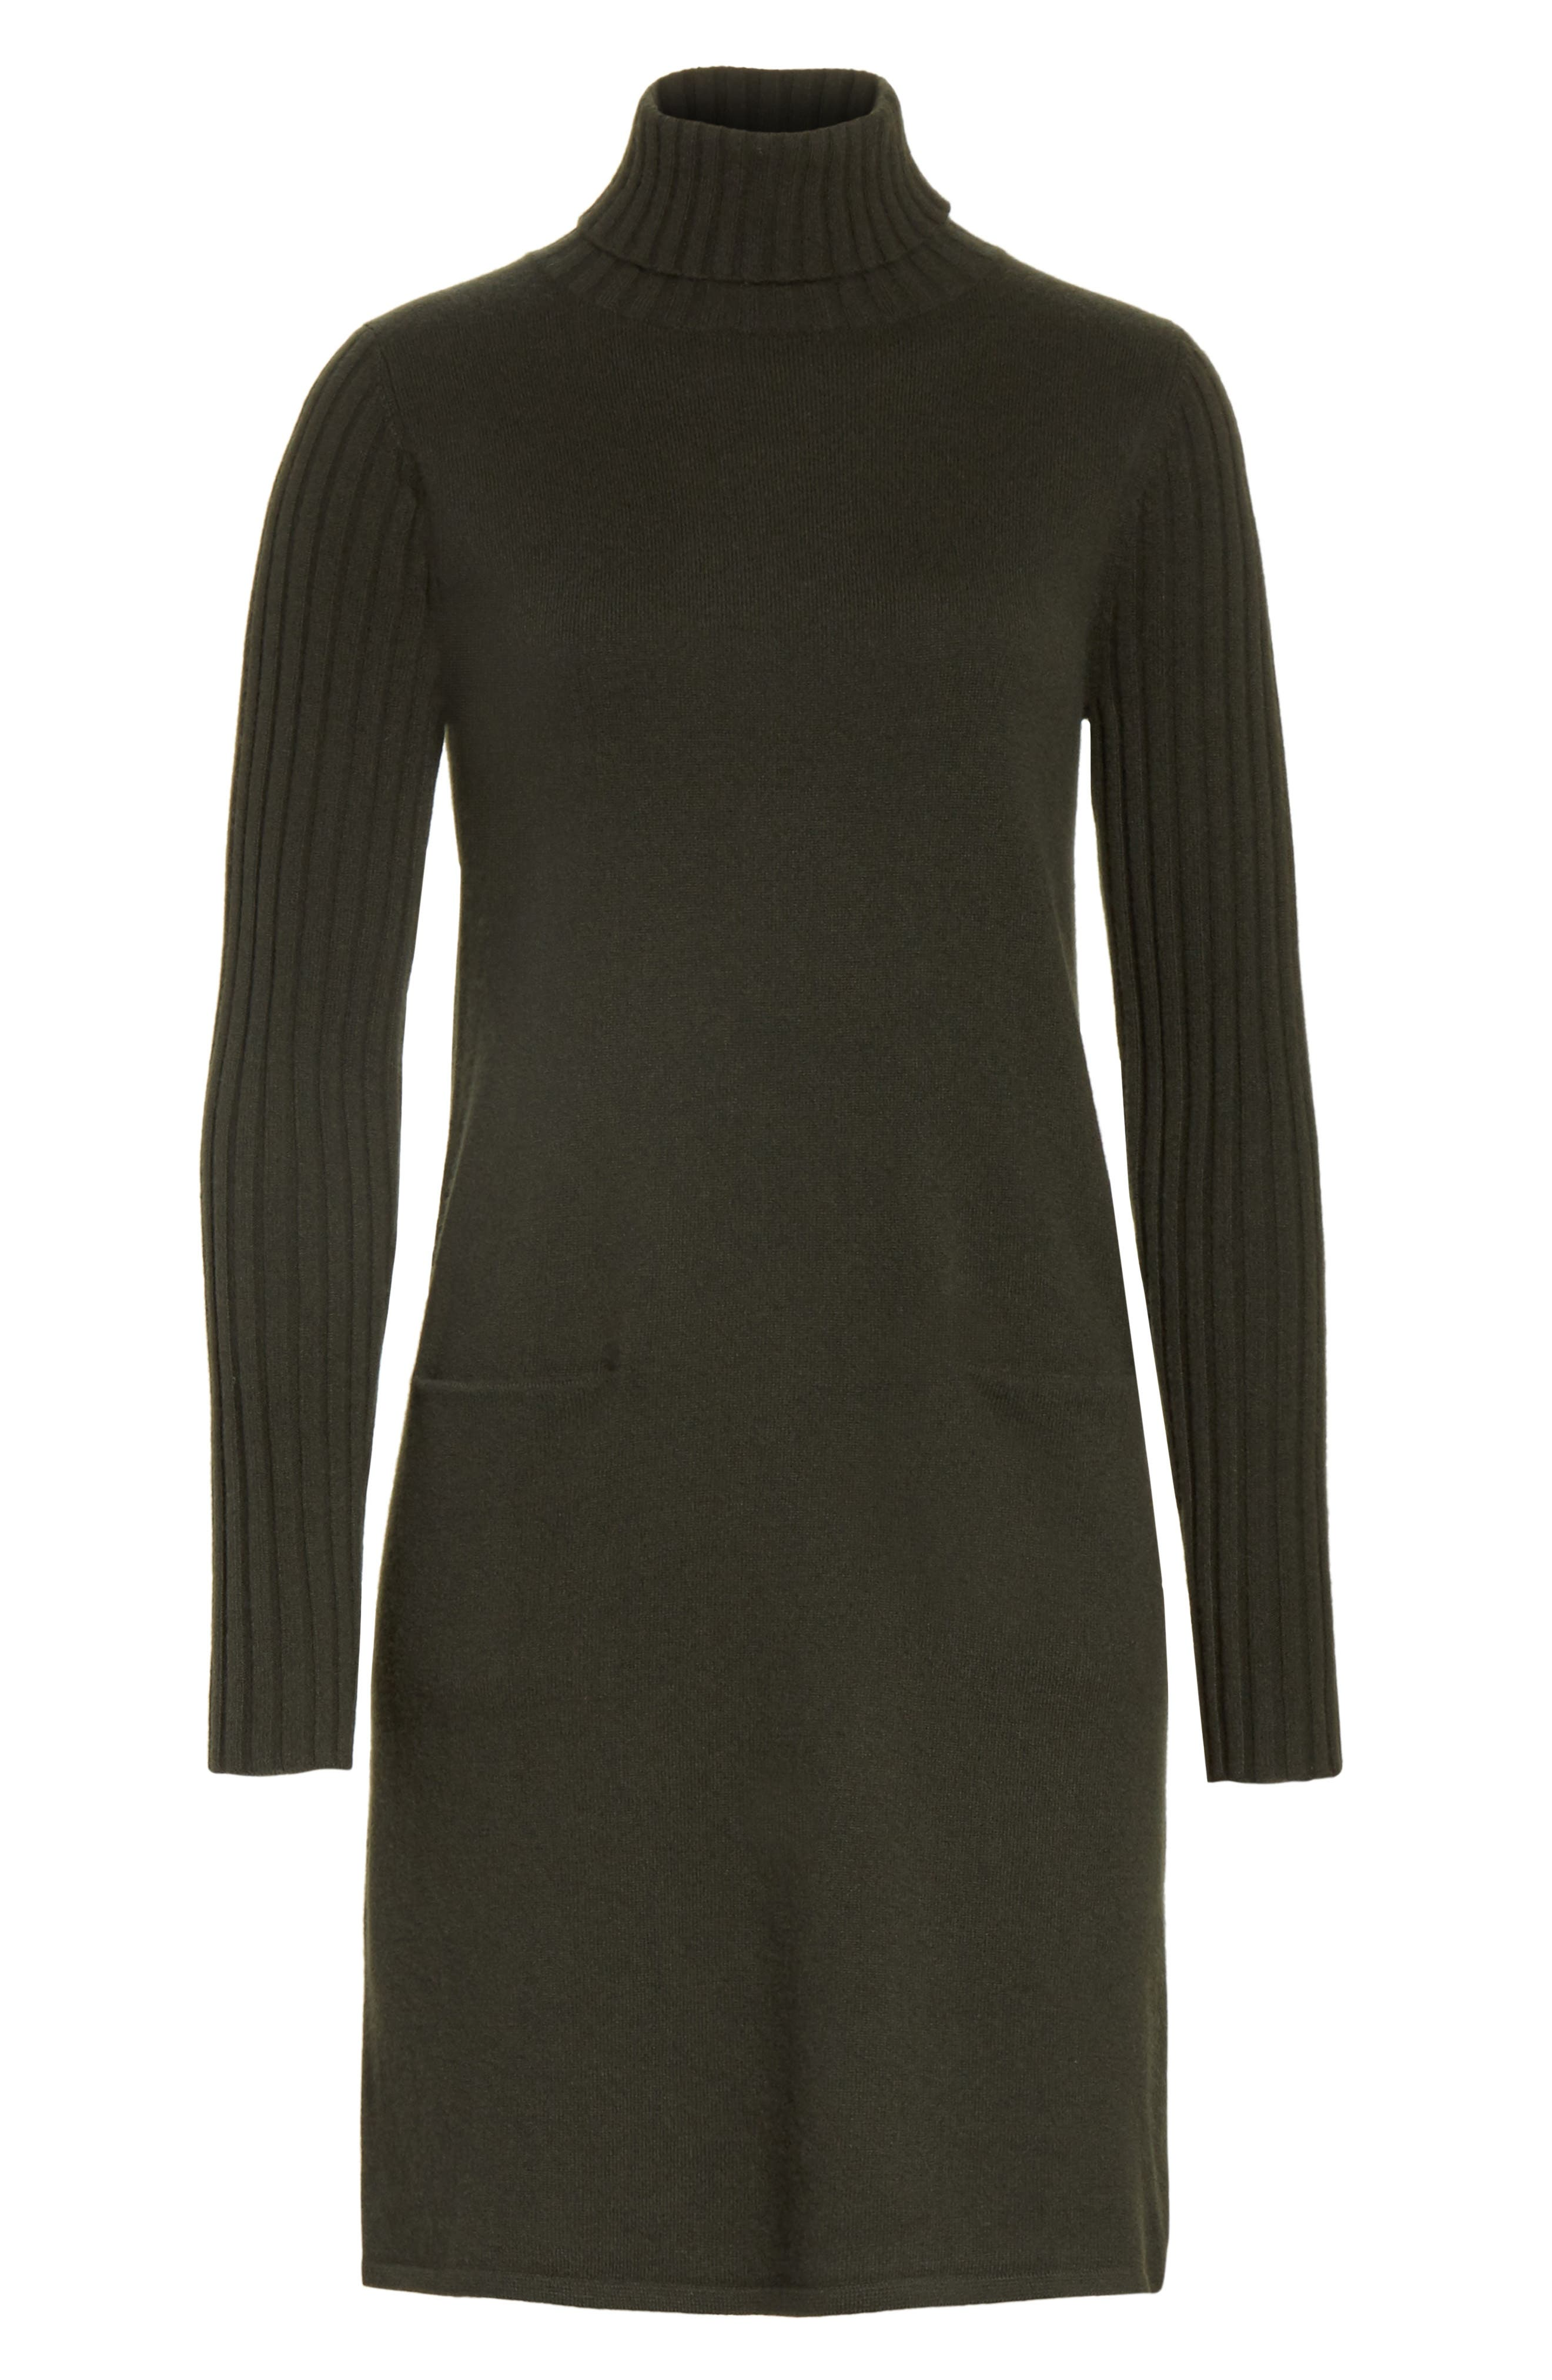 Cashmere Turtleneck Sweater Dress,                             Alternate thumbnail 6, color,                             300